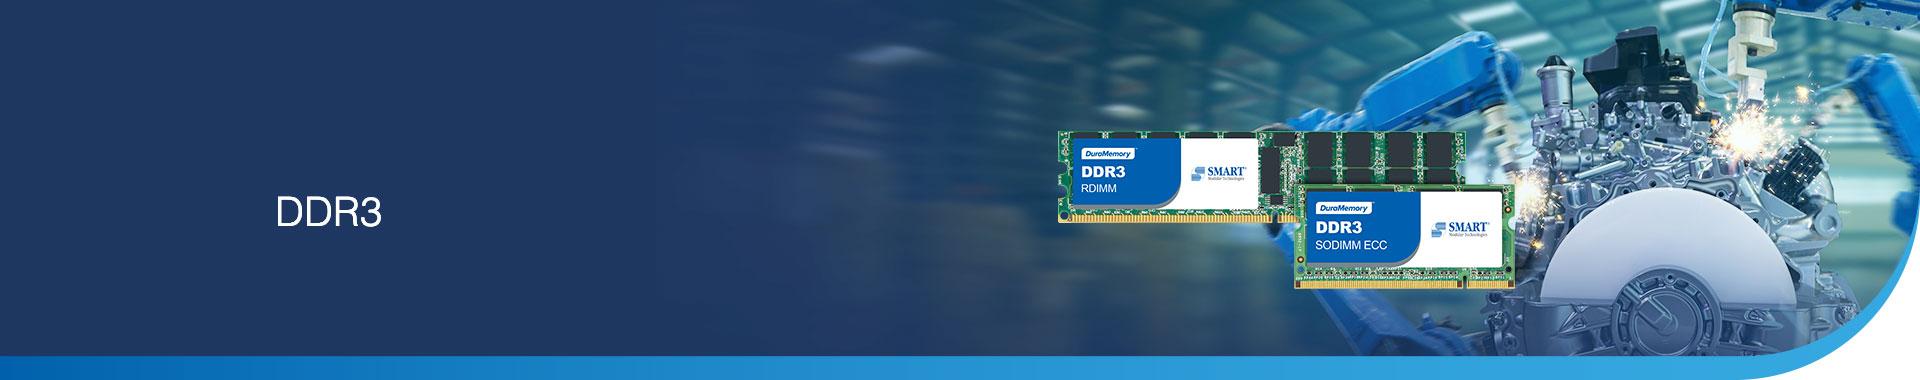 SMART_DuraMemory_DDR3